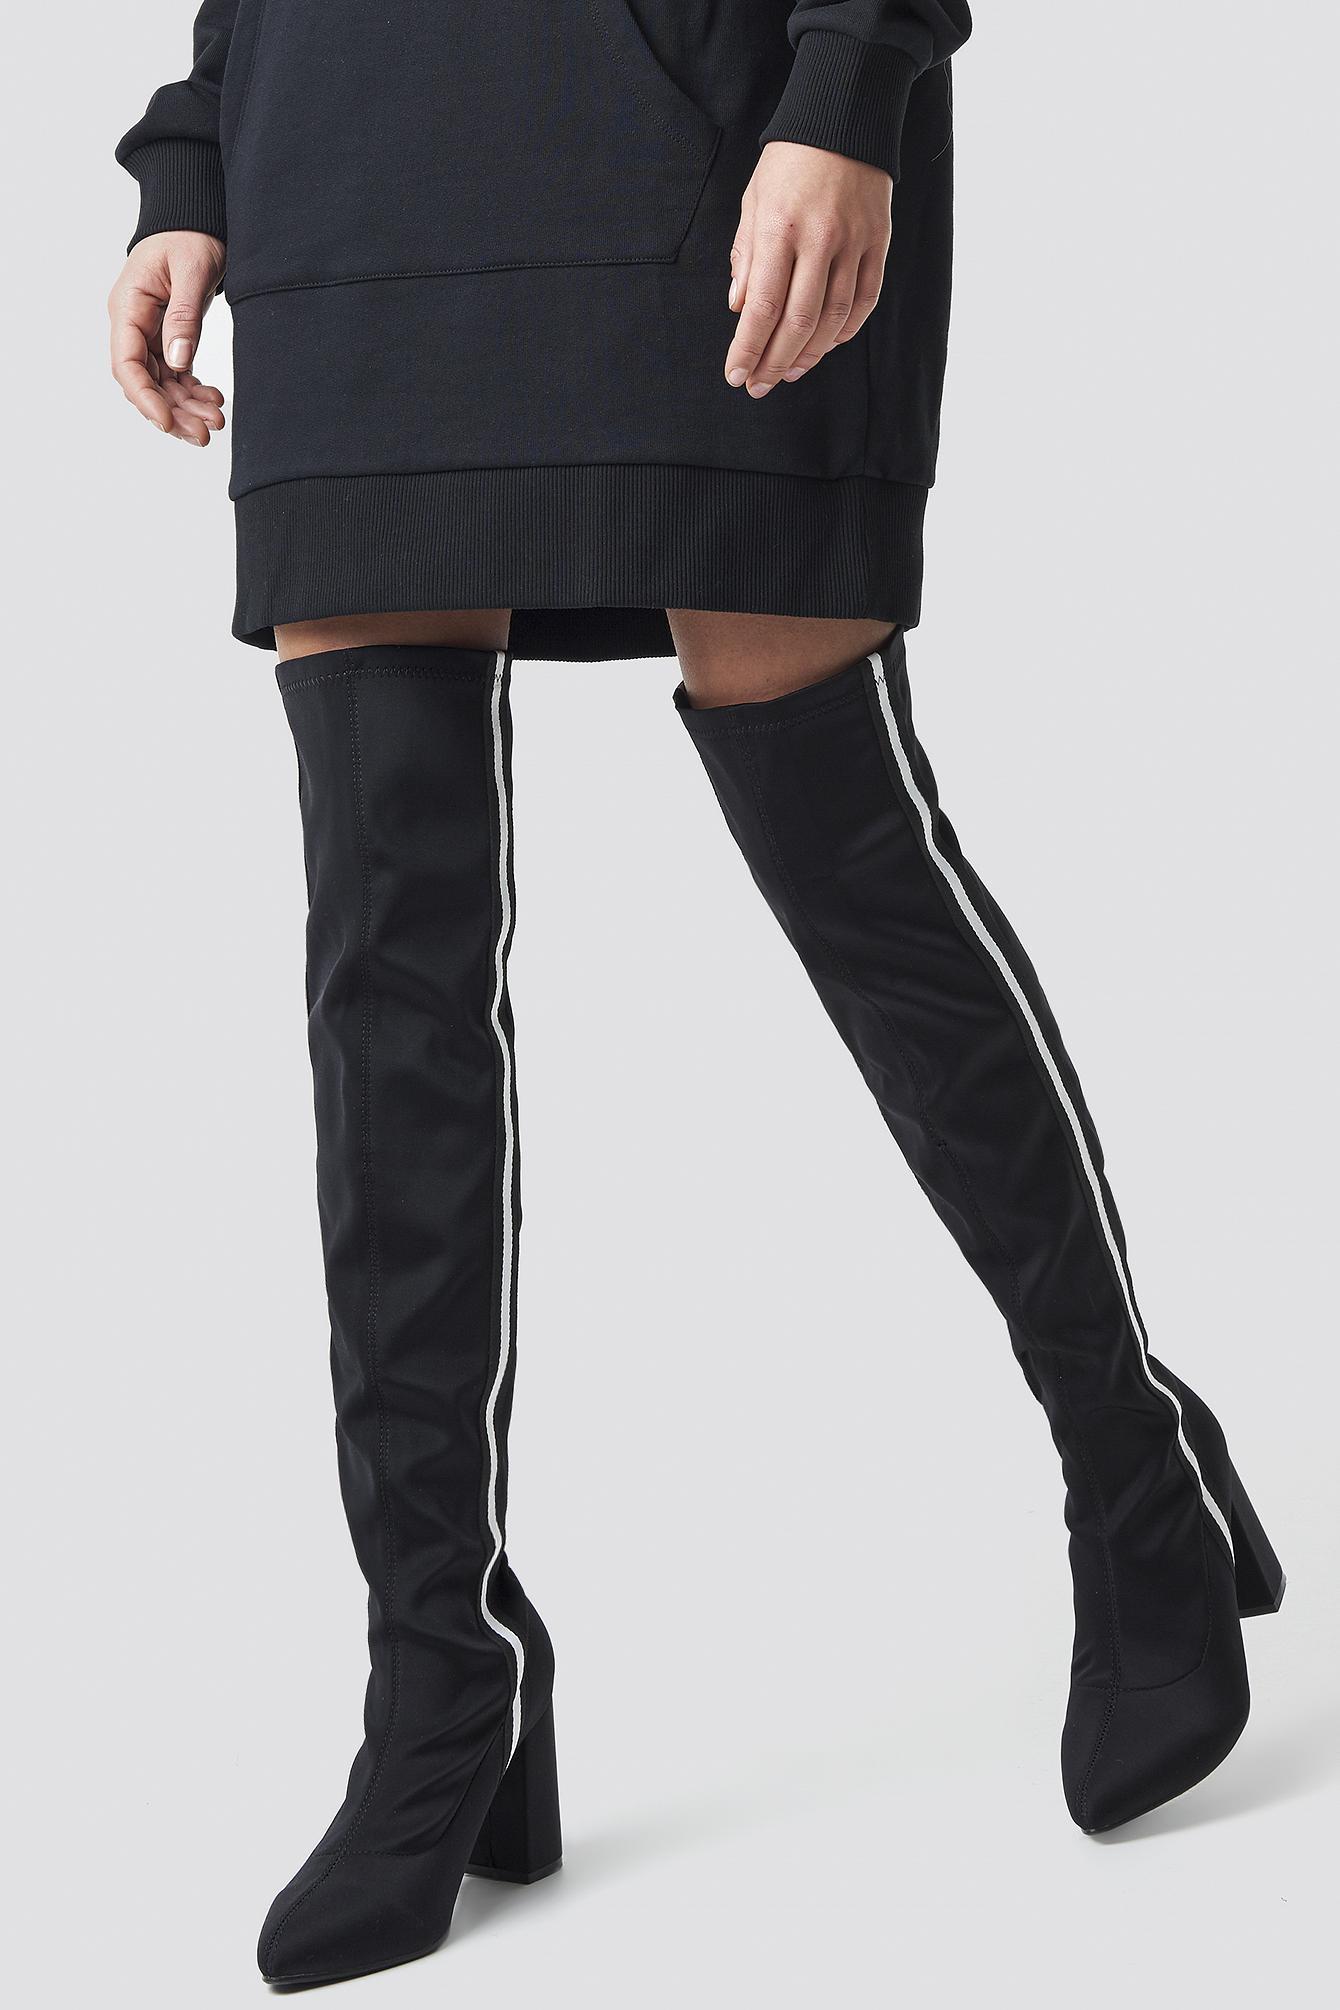 release date f270d fe6b2 NA-KD - Striped Overknee Boots Black - Lyst. View fullscreen